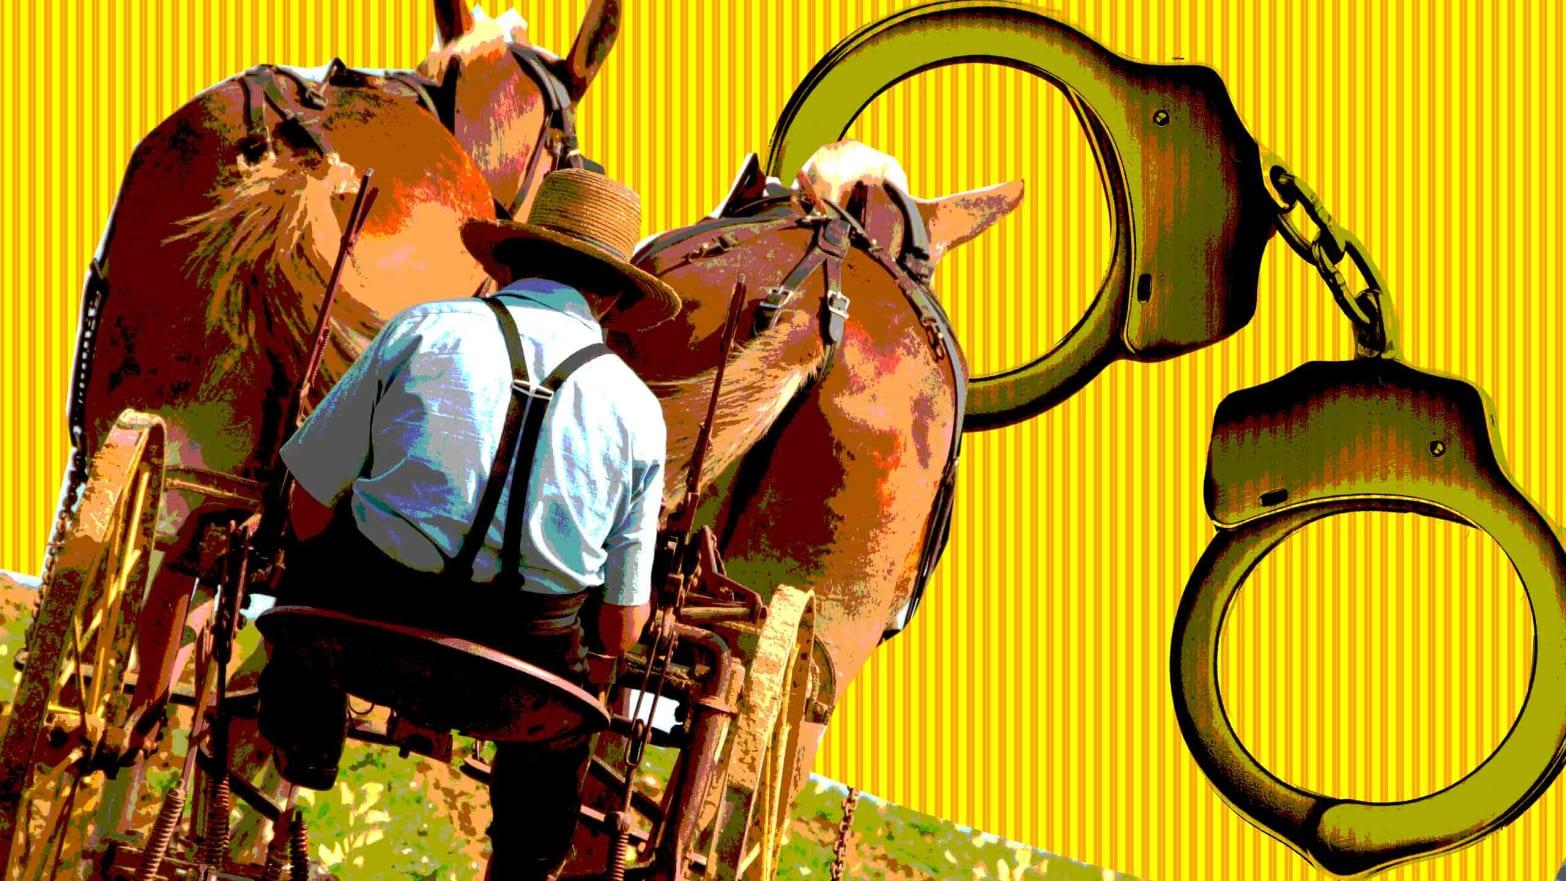 How the FDA Made a Felon Out of This Amish Farmer